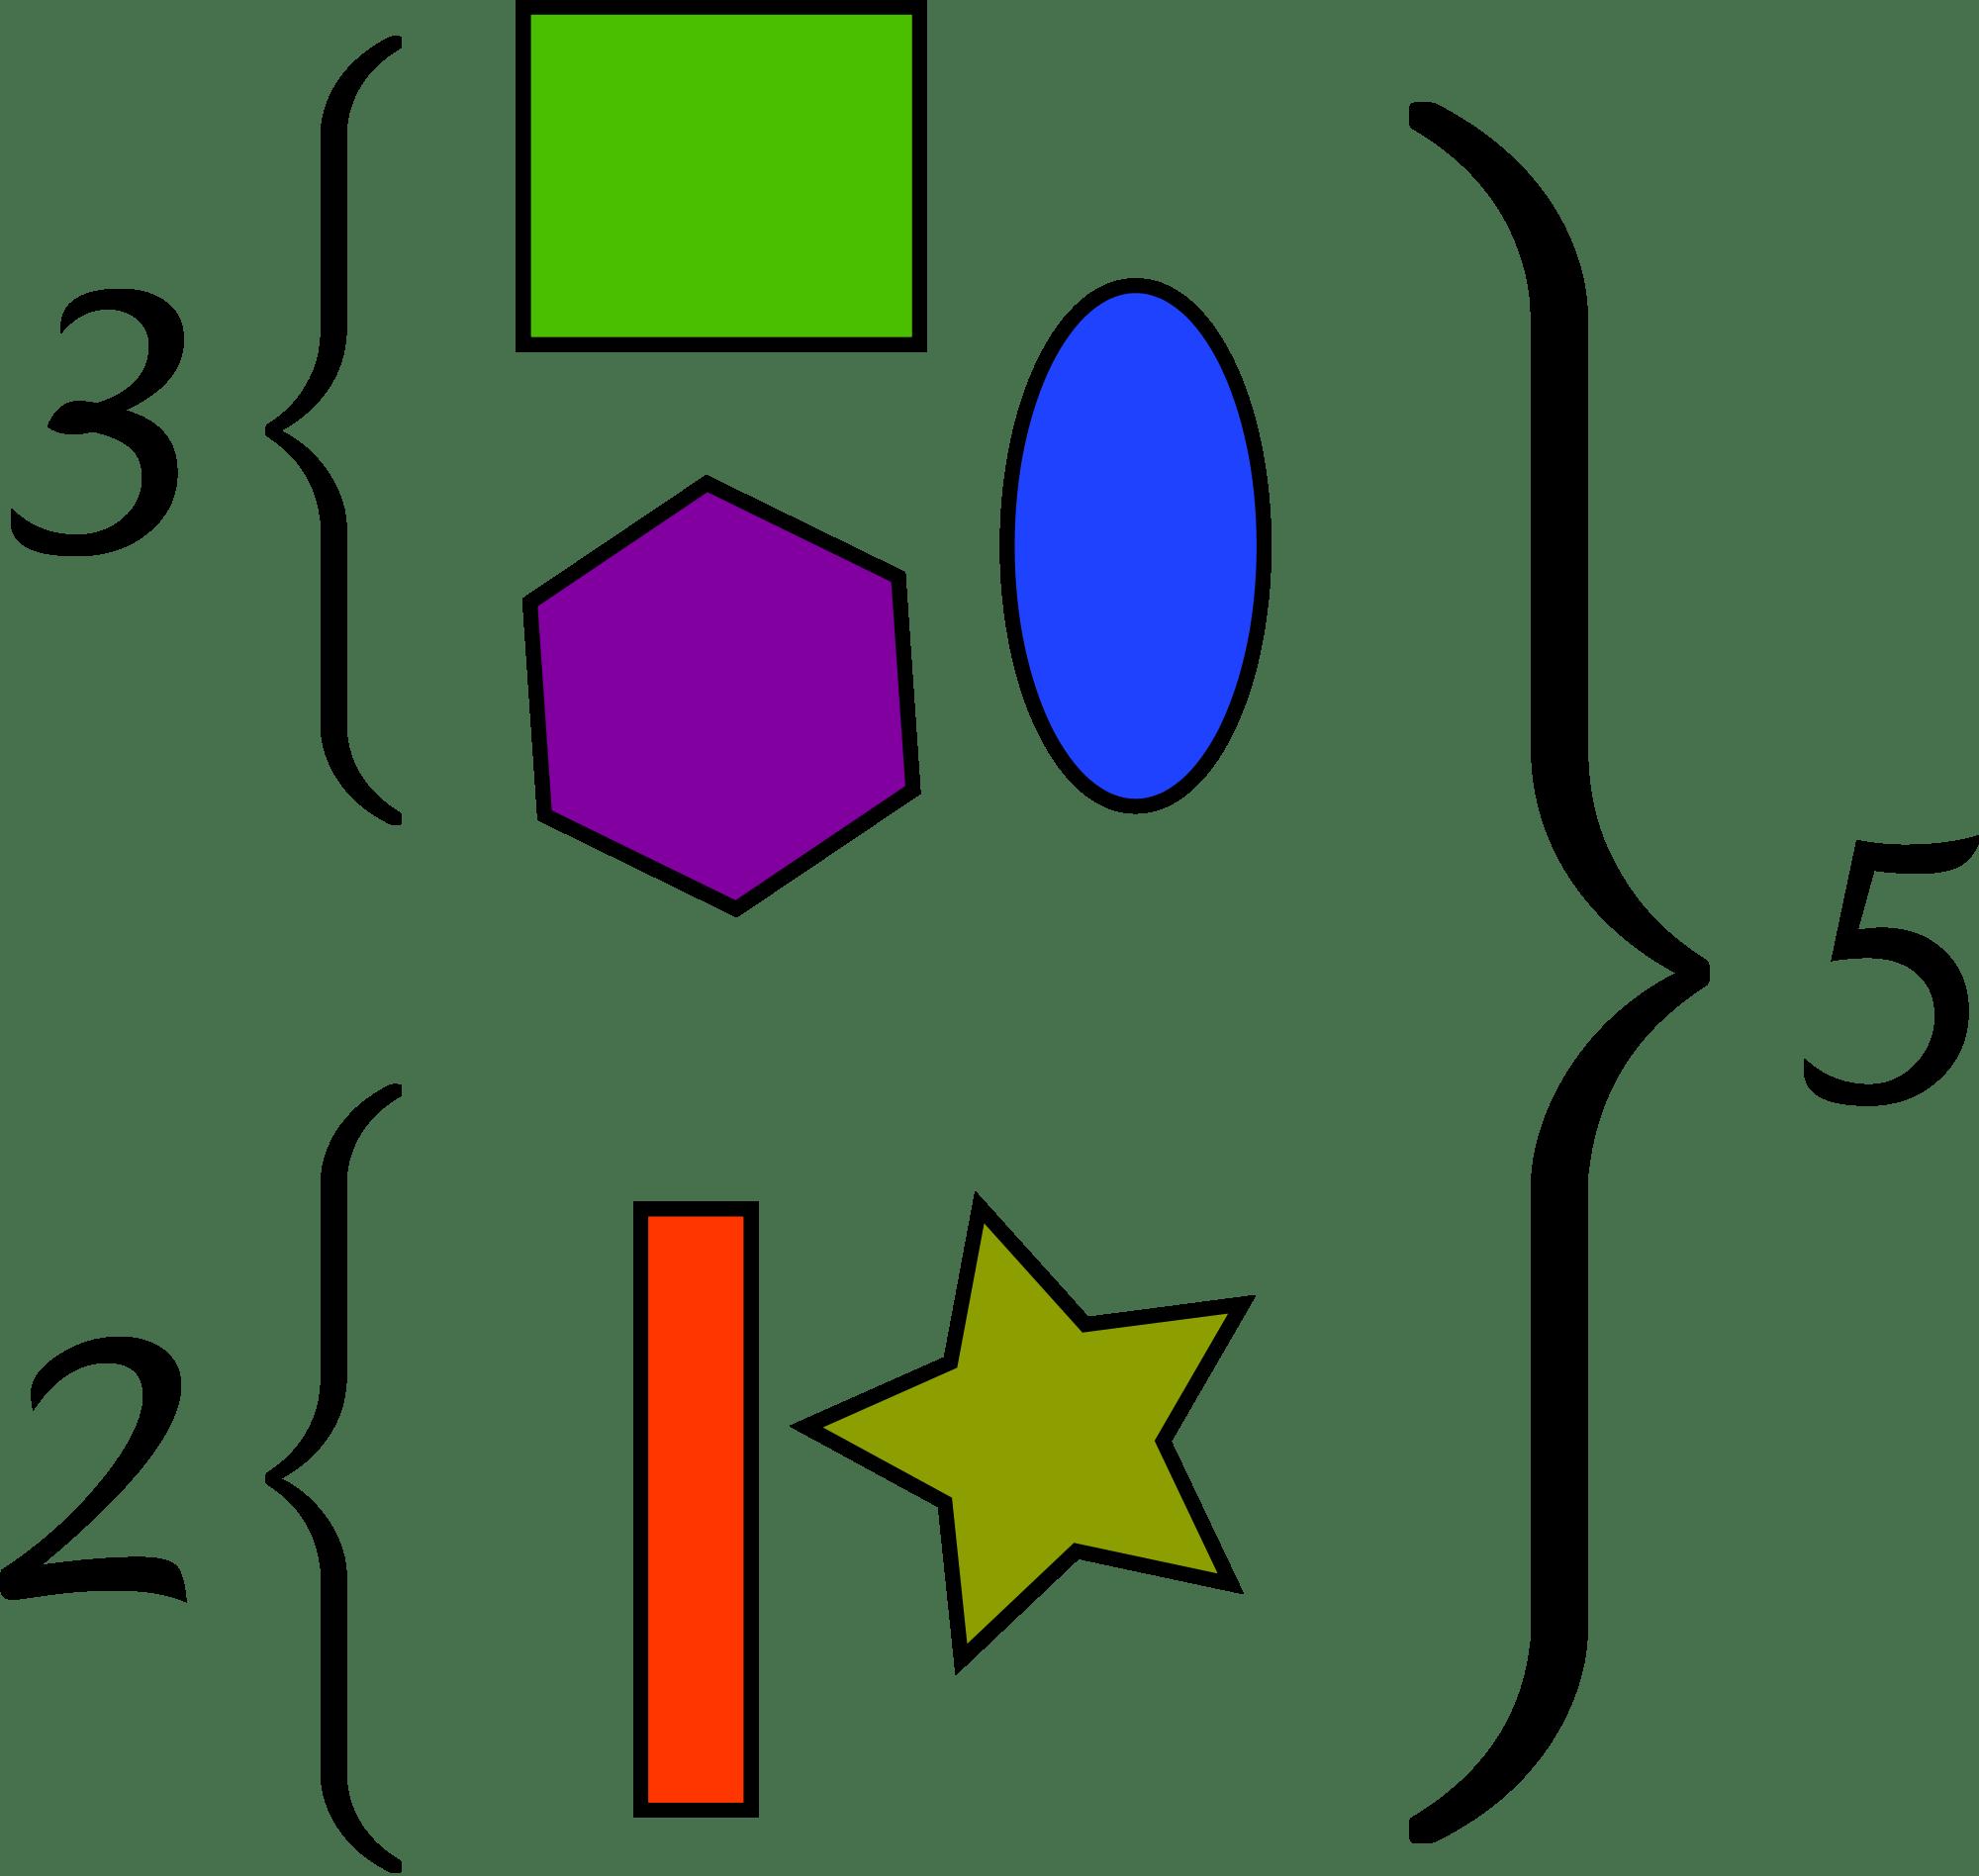 1st Grade Math Worksheets And Information For Parents